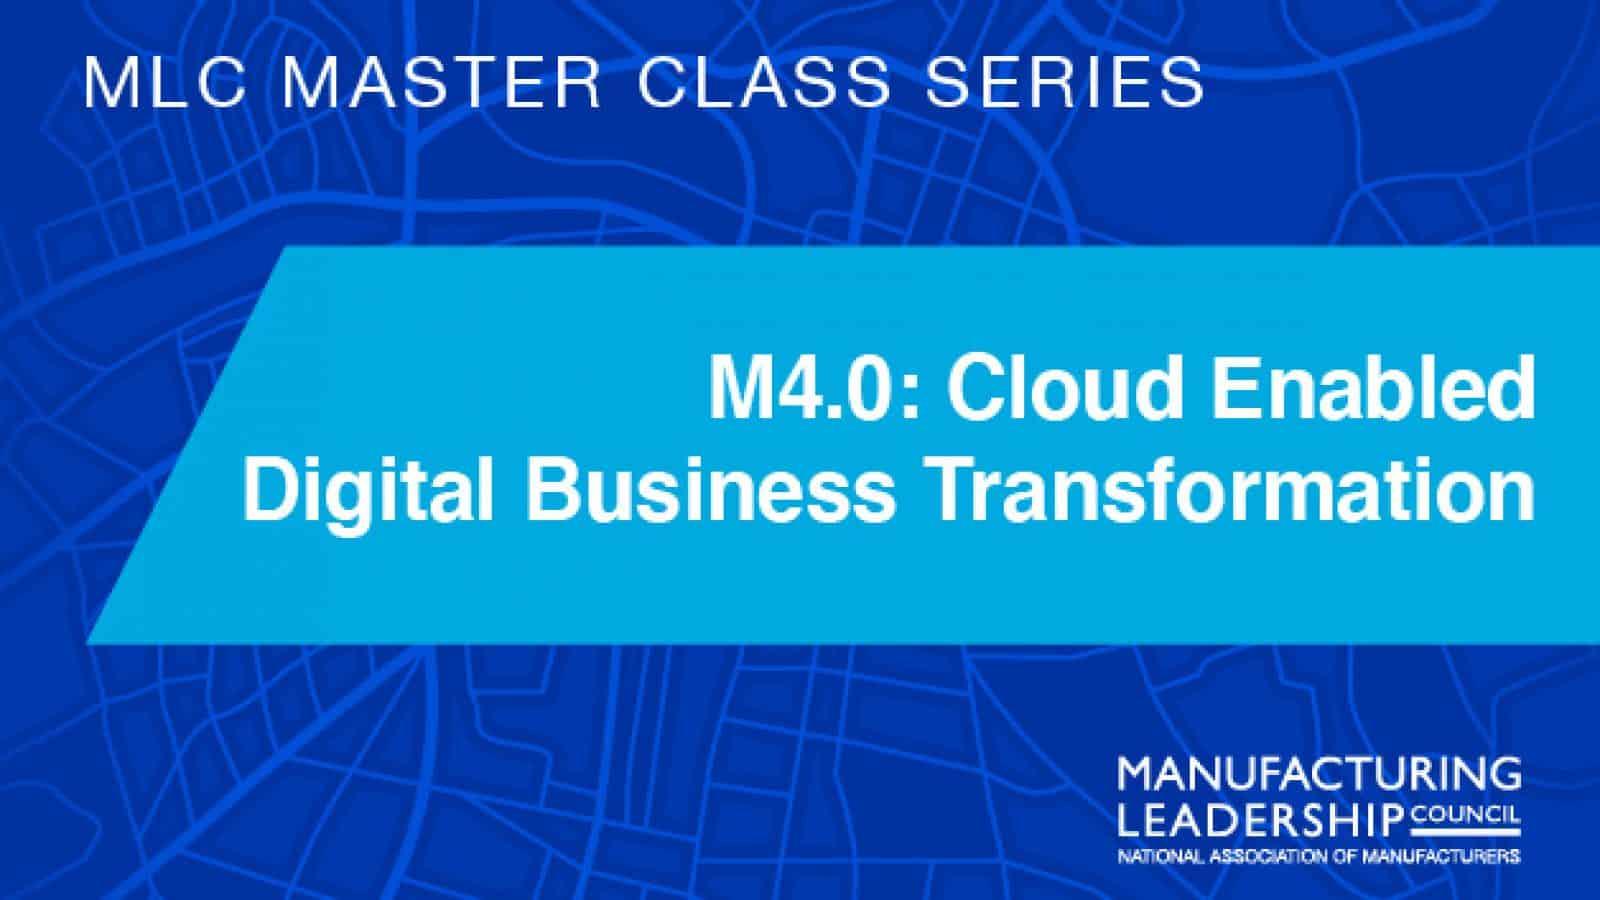 M4.0: Cloud Enabled Digital Business Transformation